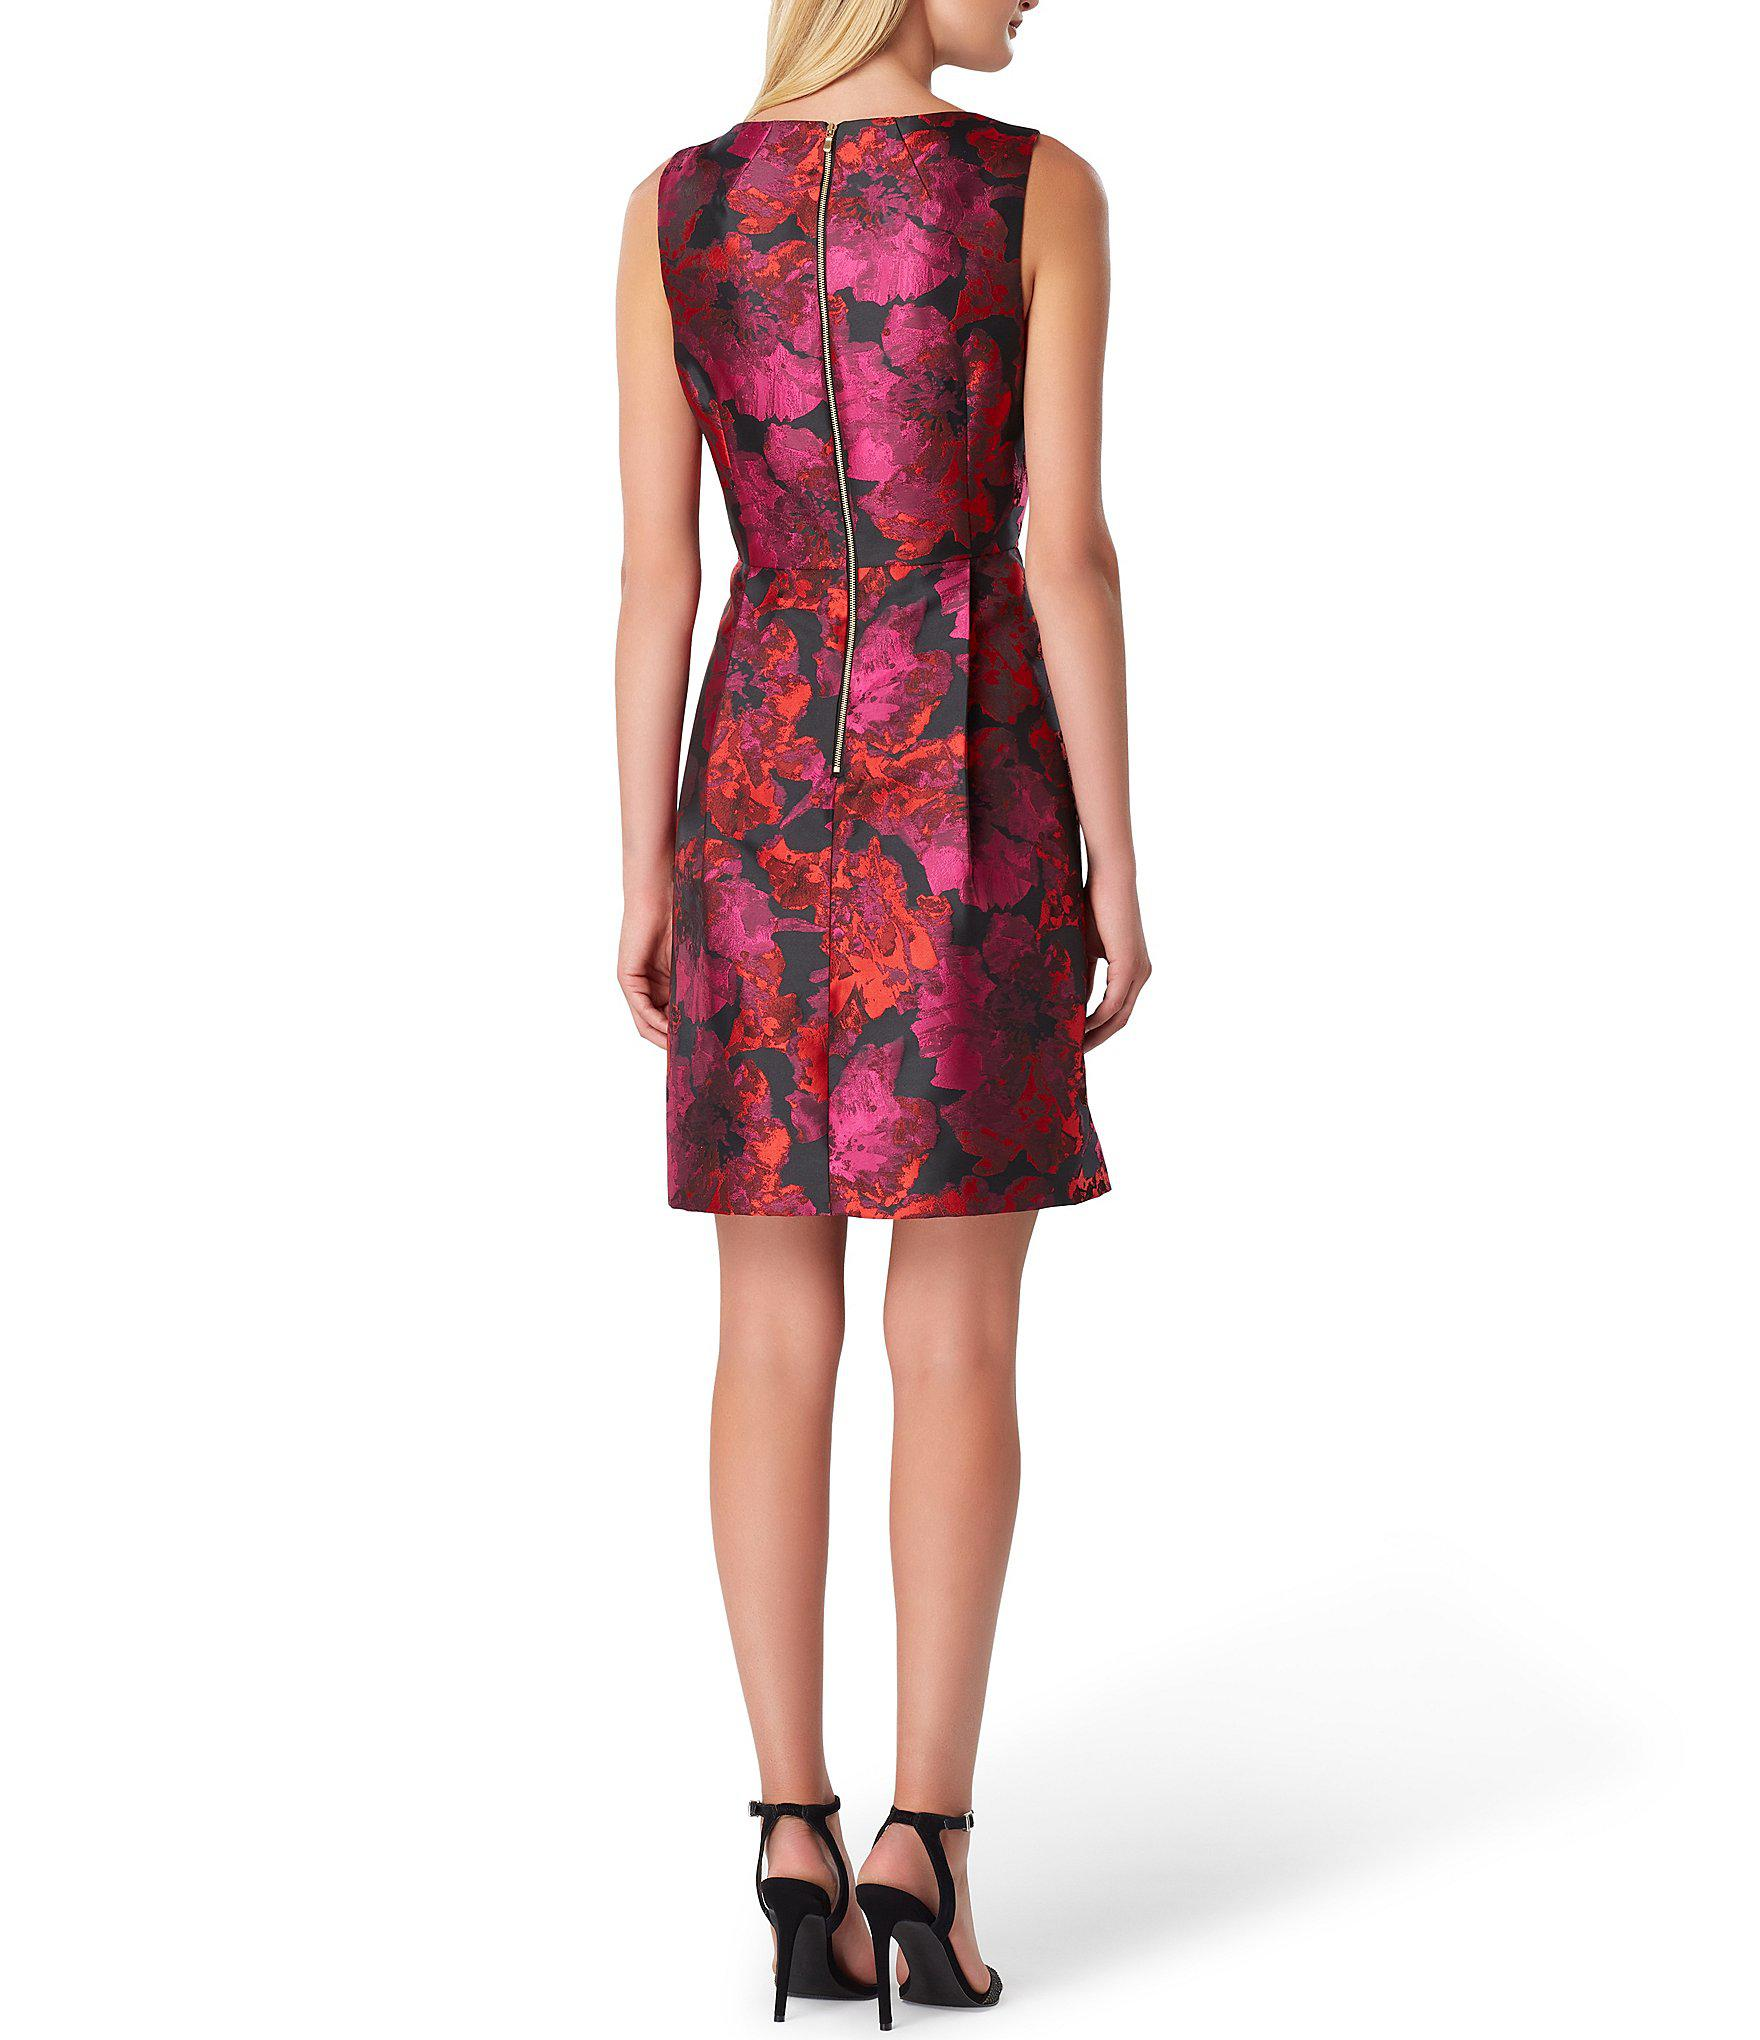 8773a571fe4 Tahari - Red Petite Bow Front Floral Printed Metallic Jacquard A-line Dress  - Lyst. View fullscreen